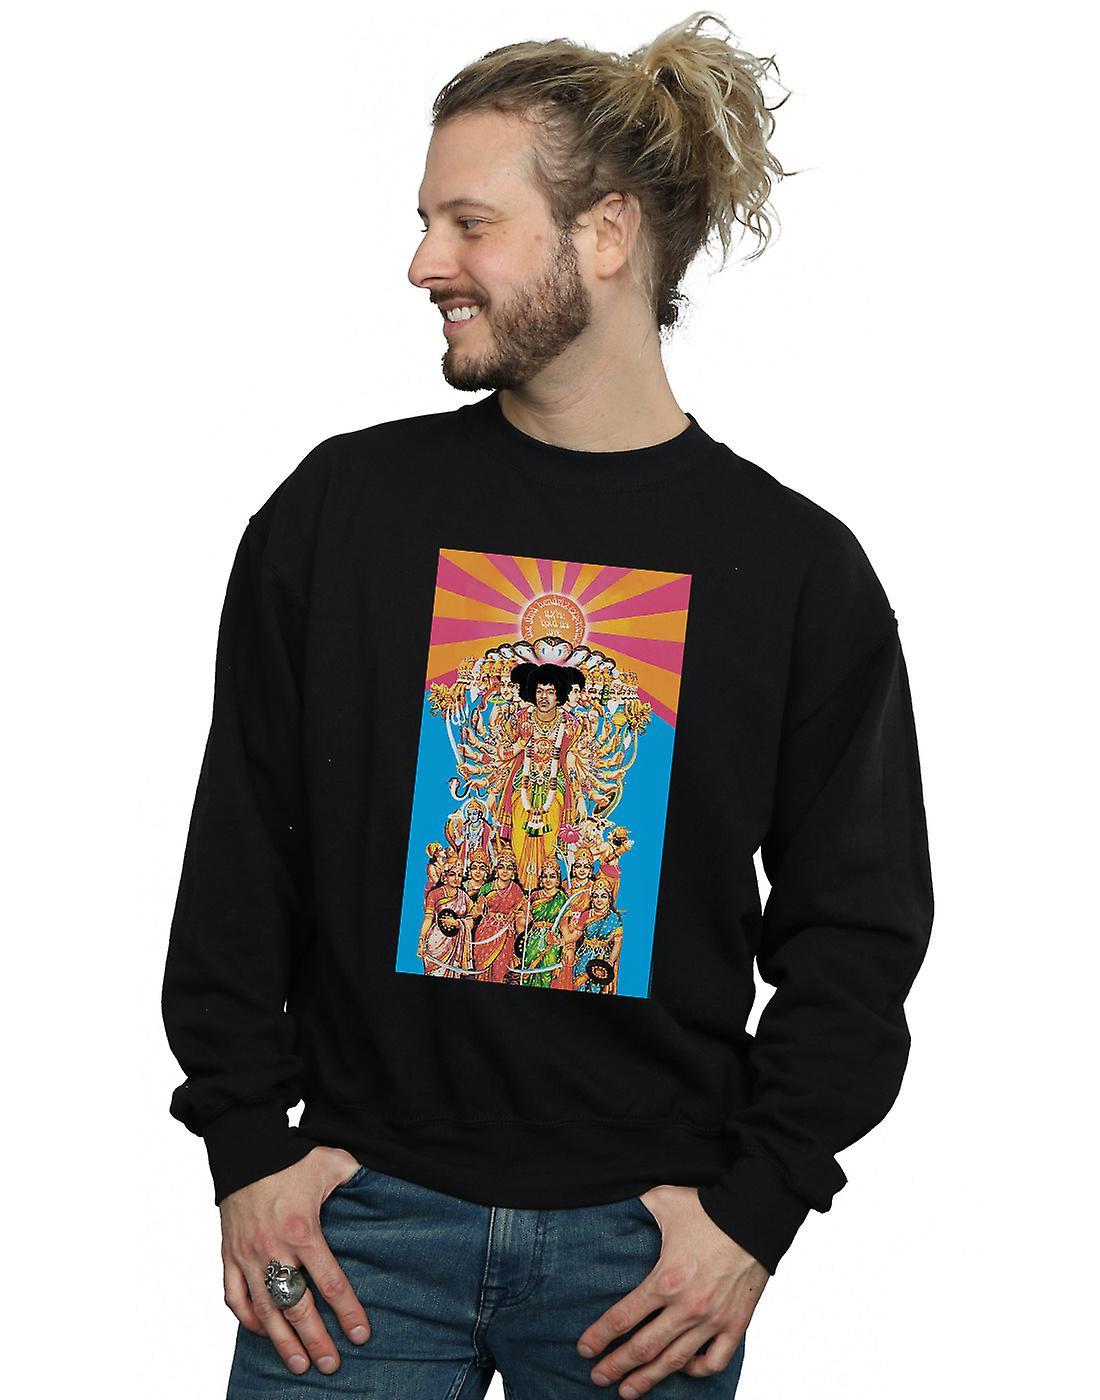 Jimi Hendrix Men's Axis Bold As Love Sweatshirt